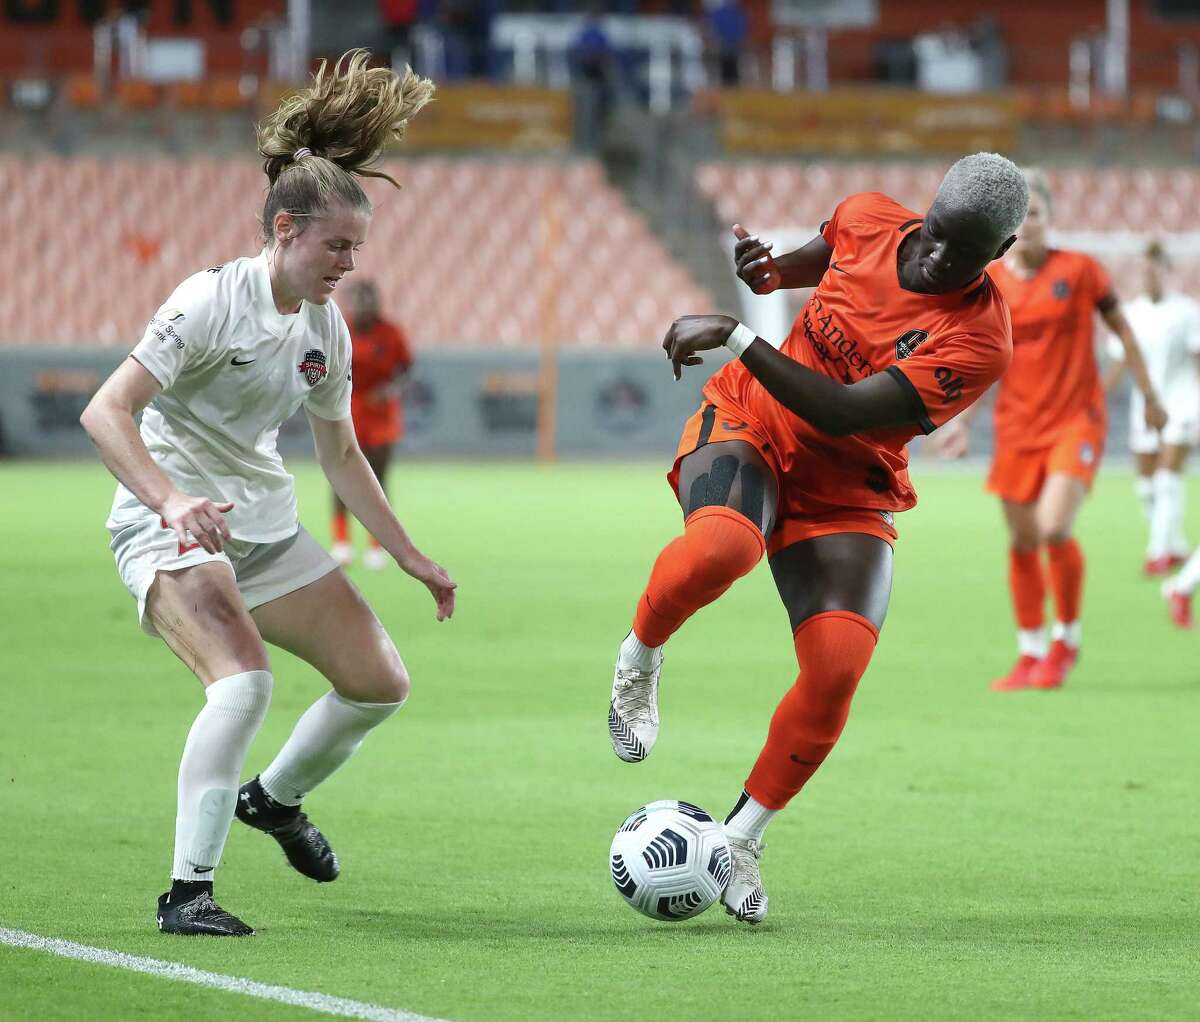 Houston Dash Michaela Abam (34) battles against Washington Spirit midfielder Anna Heilferty (21) during the second half of a National Women's Soccer League game at BBVA Stadium, Friday, August 13, 2021, in Houston. Final score was 2-2. .